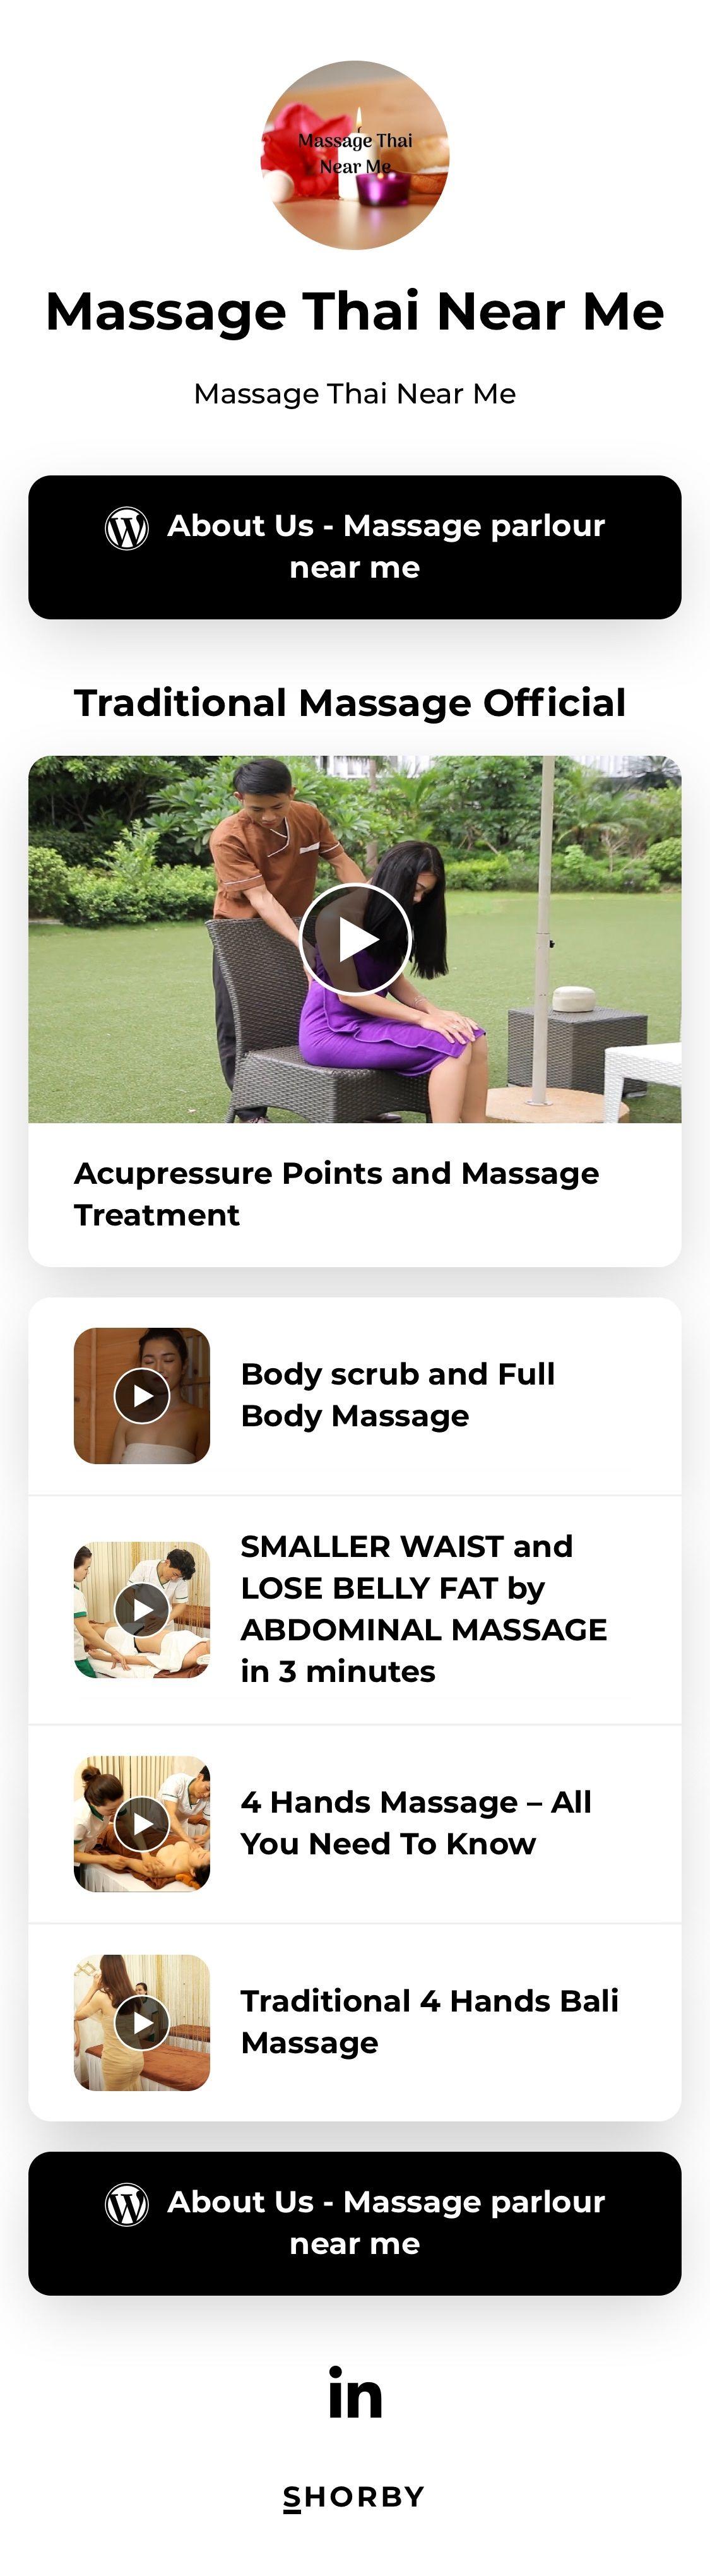 Massage thai near me massage treatment massage parlors